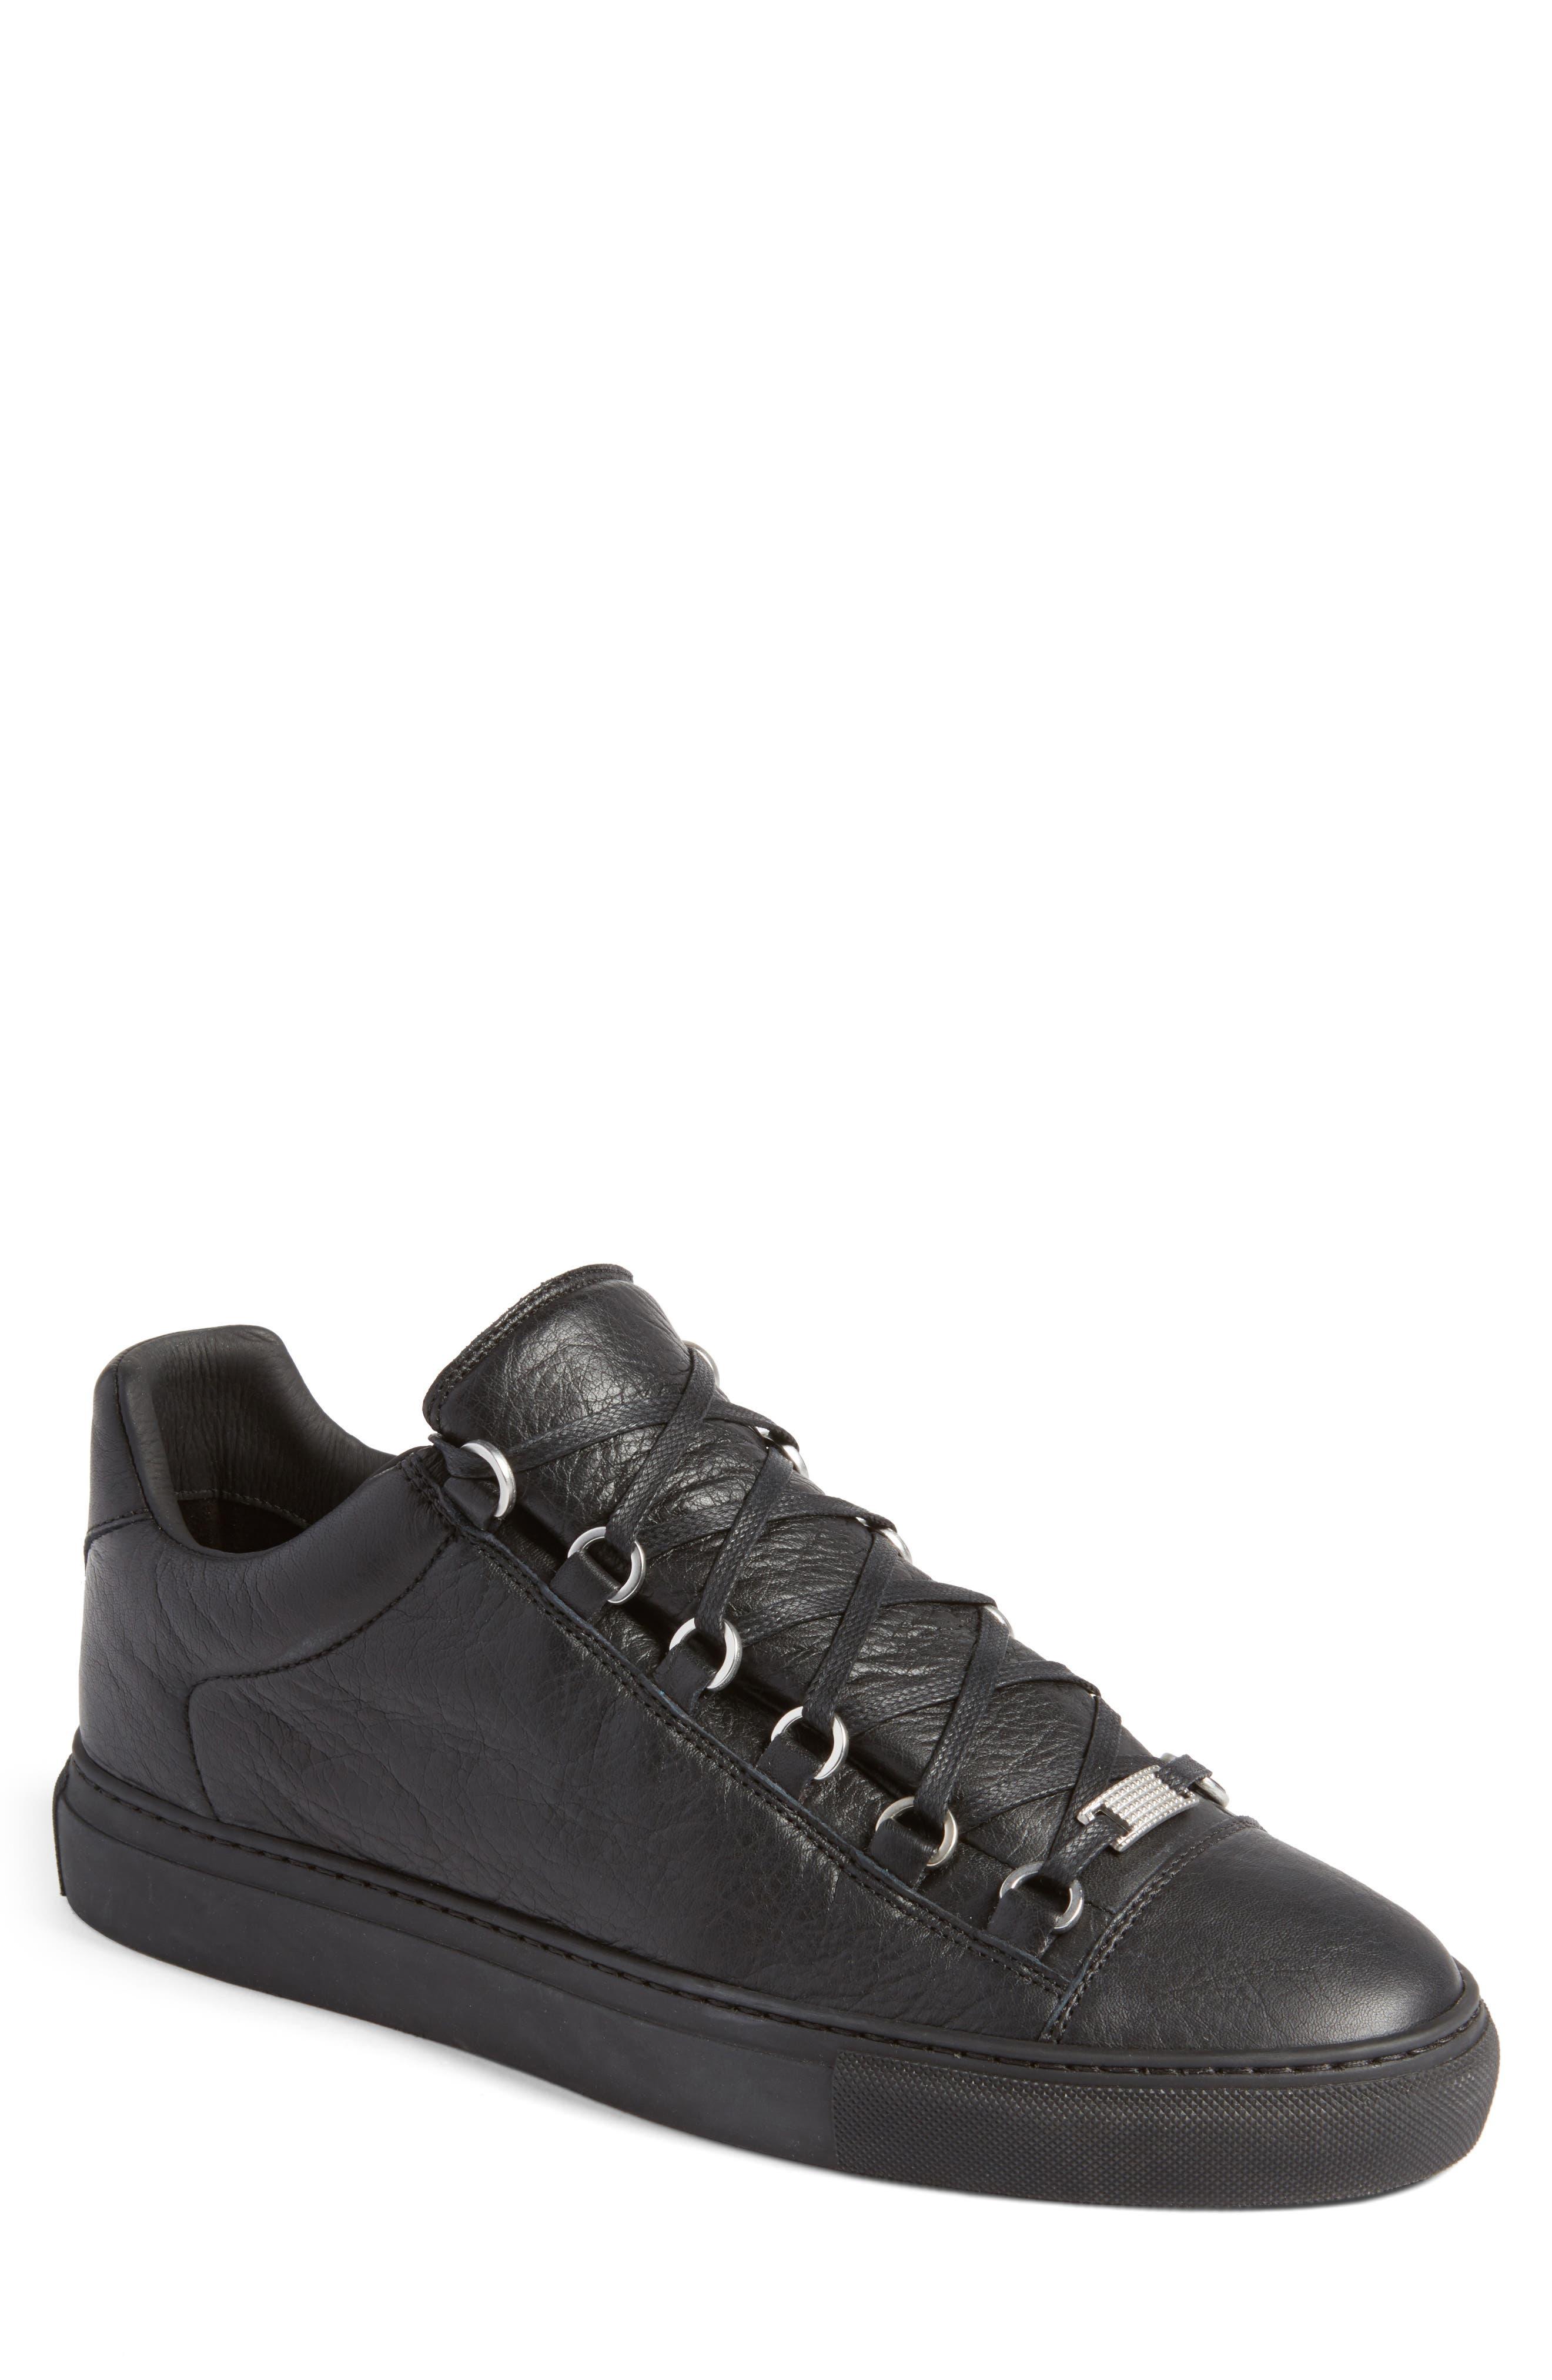 Main Image - Balenciaga Arena Low Sneaker (Men)